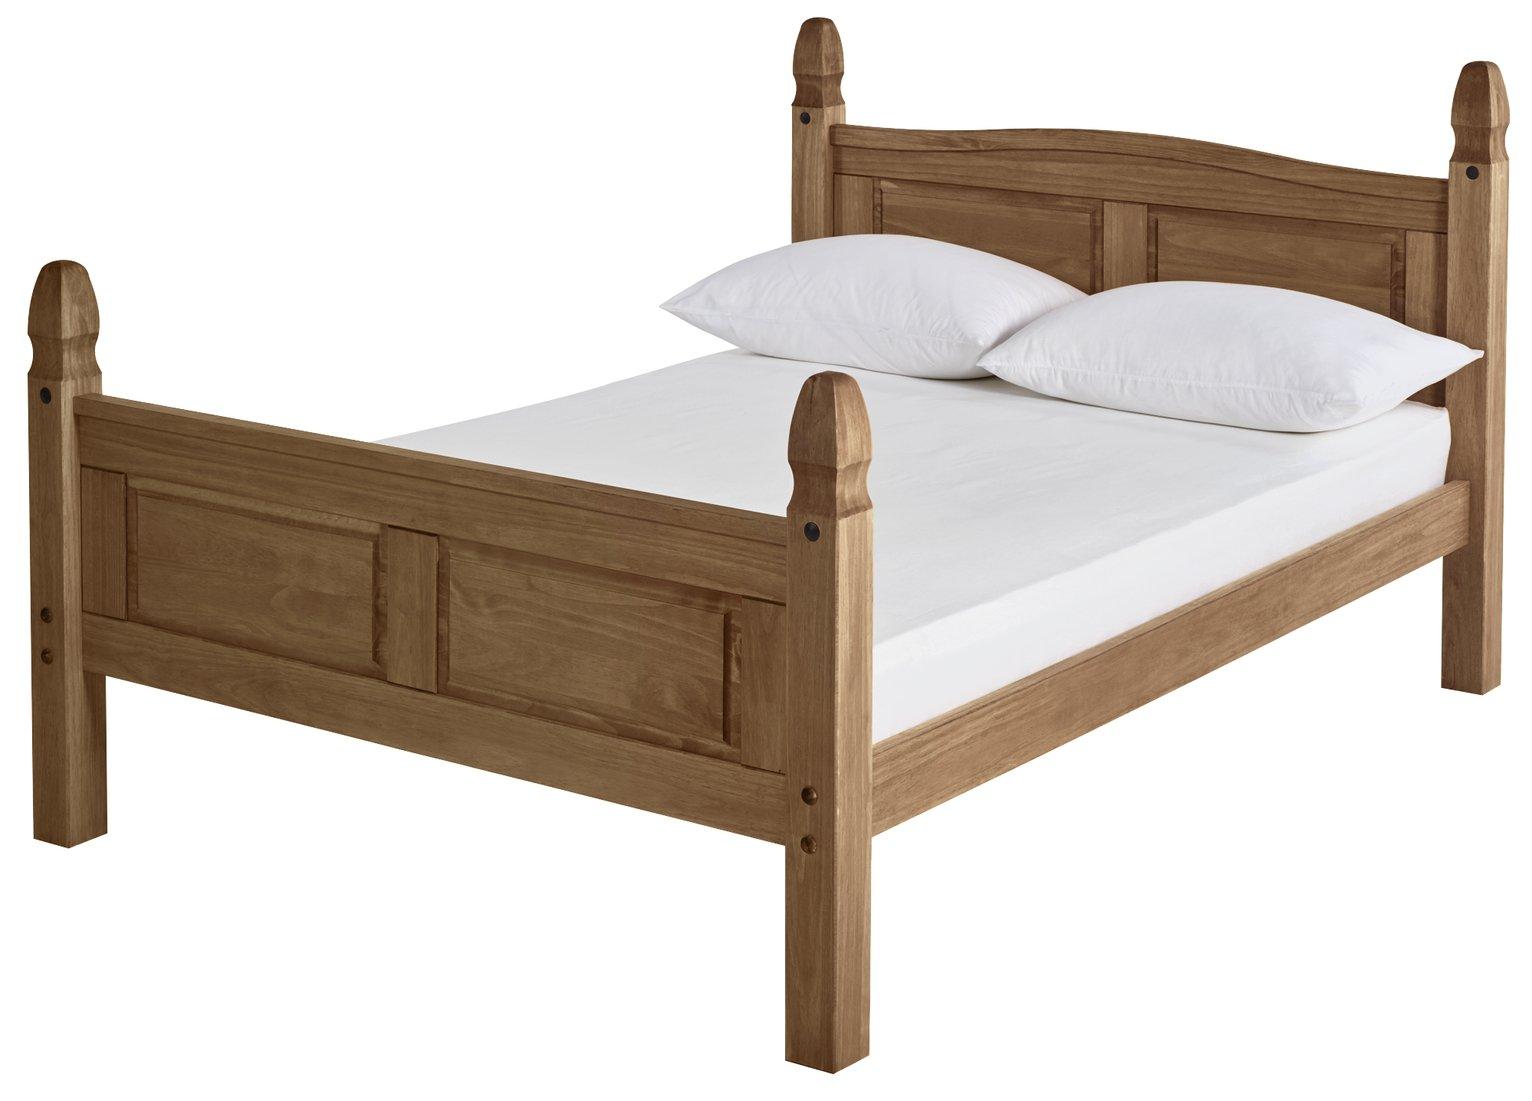 Argos Home Puerto Rico Double Bed Frame - Dark Pine